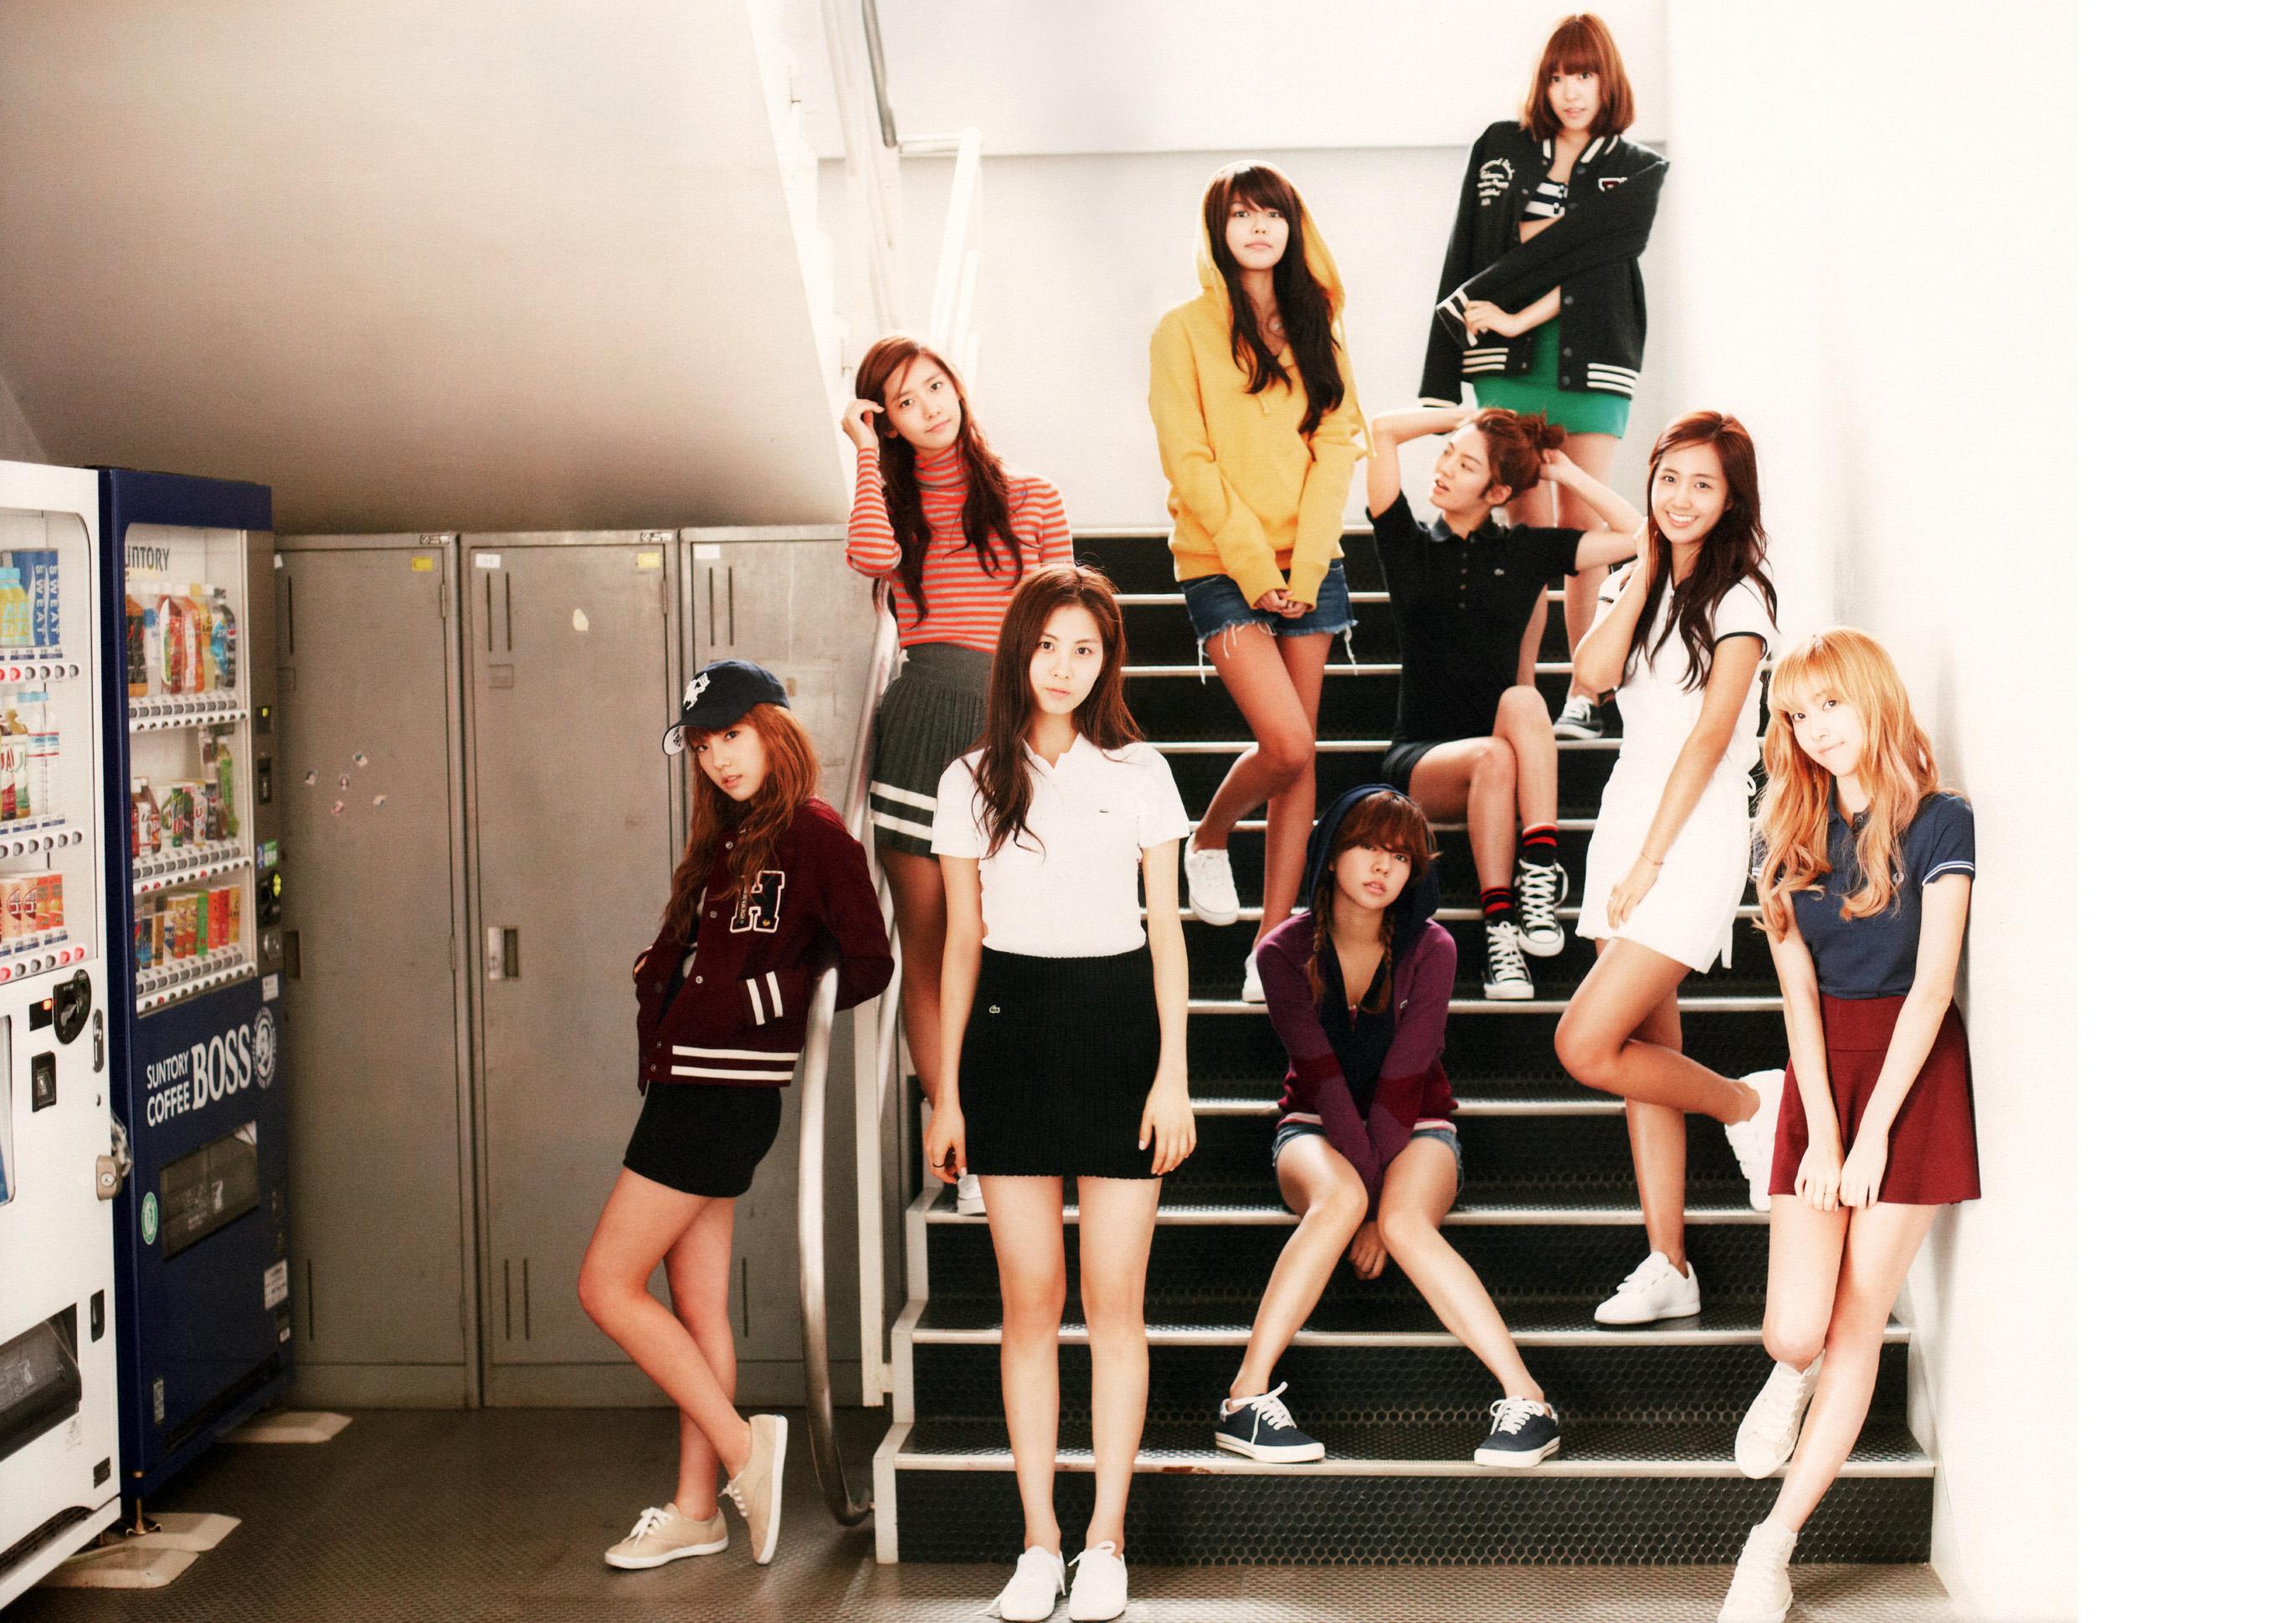 [PB] Girls' Generation 少女時代 - 少女 In Tokyo (2010.06.07) (255P/213.8MB) 001-jpg